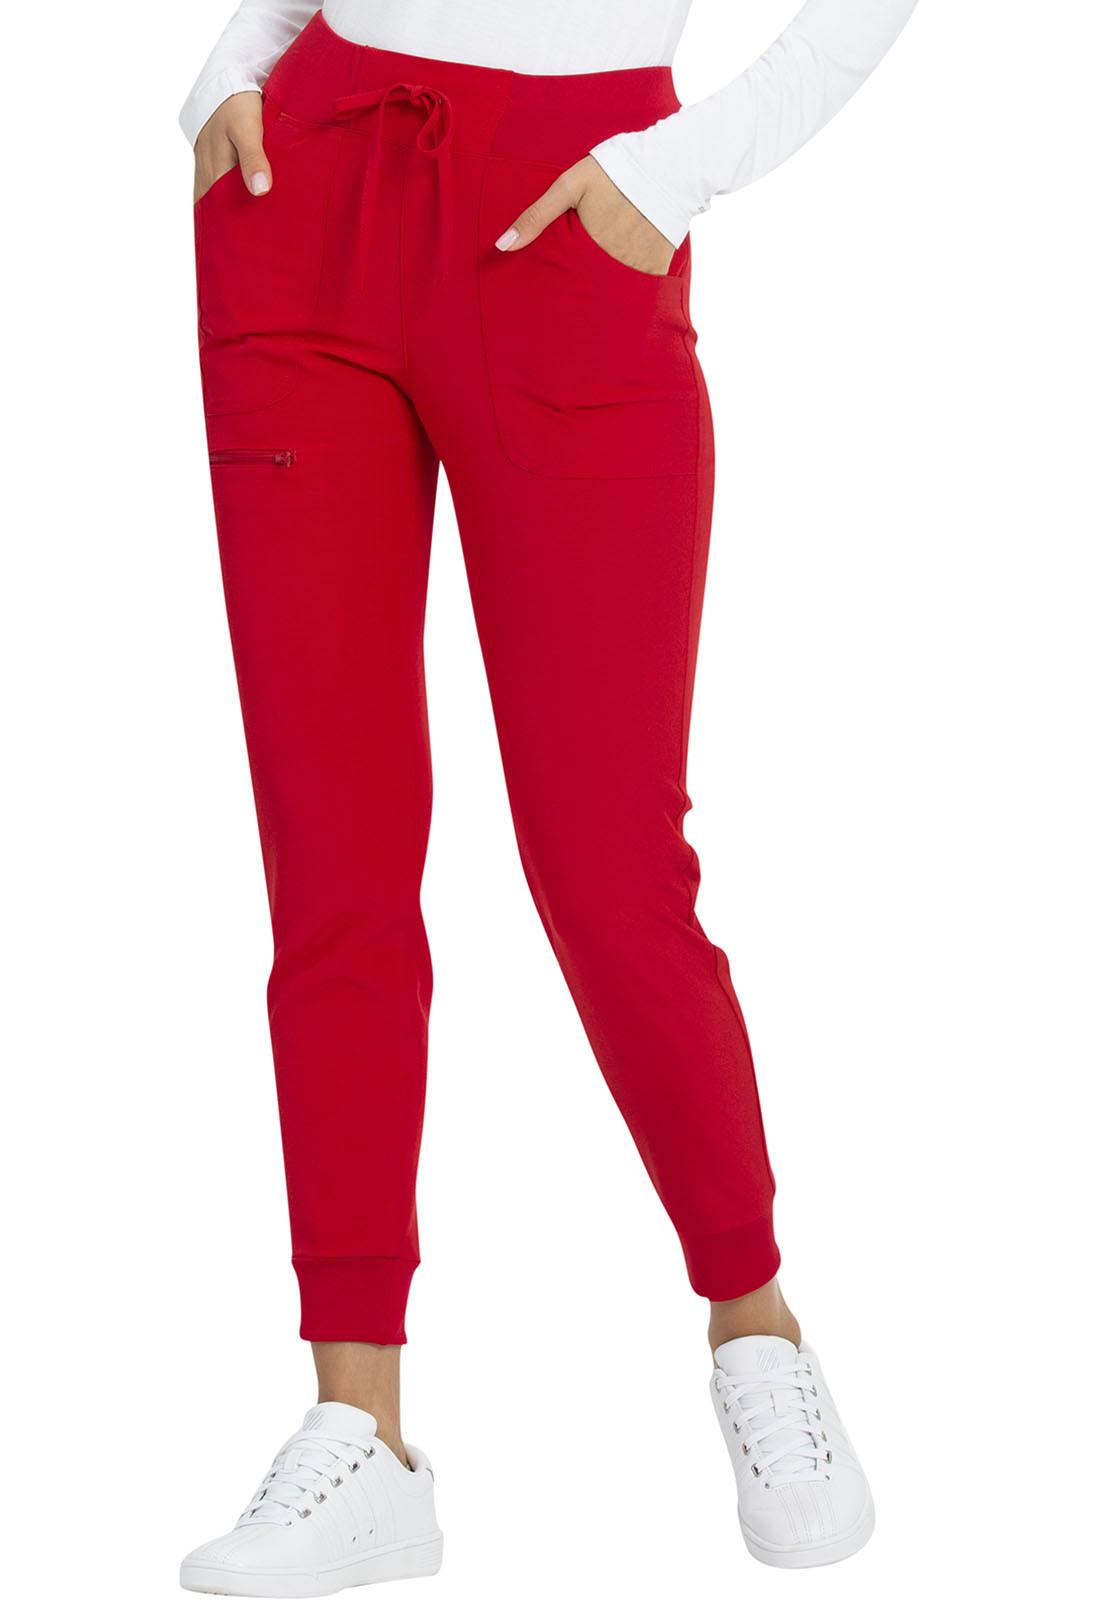 HEART SOUL Red Women's Tall Jogger Scrub Pants HS030T-RDHH